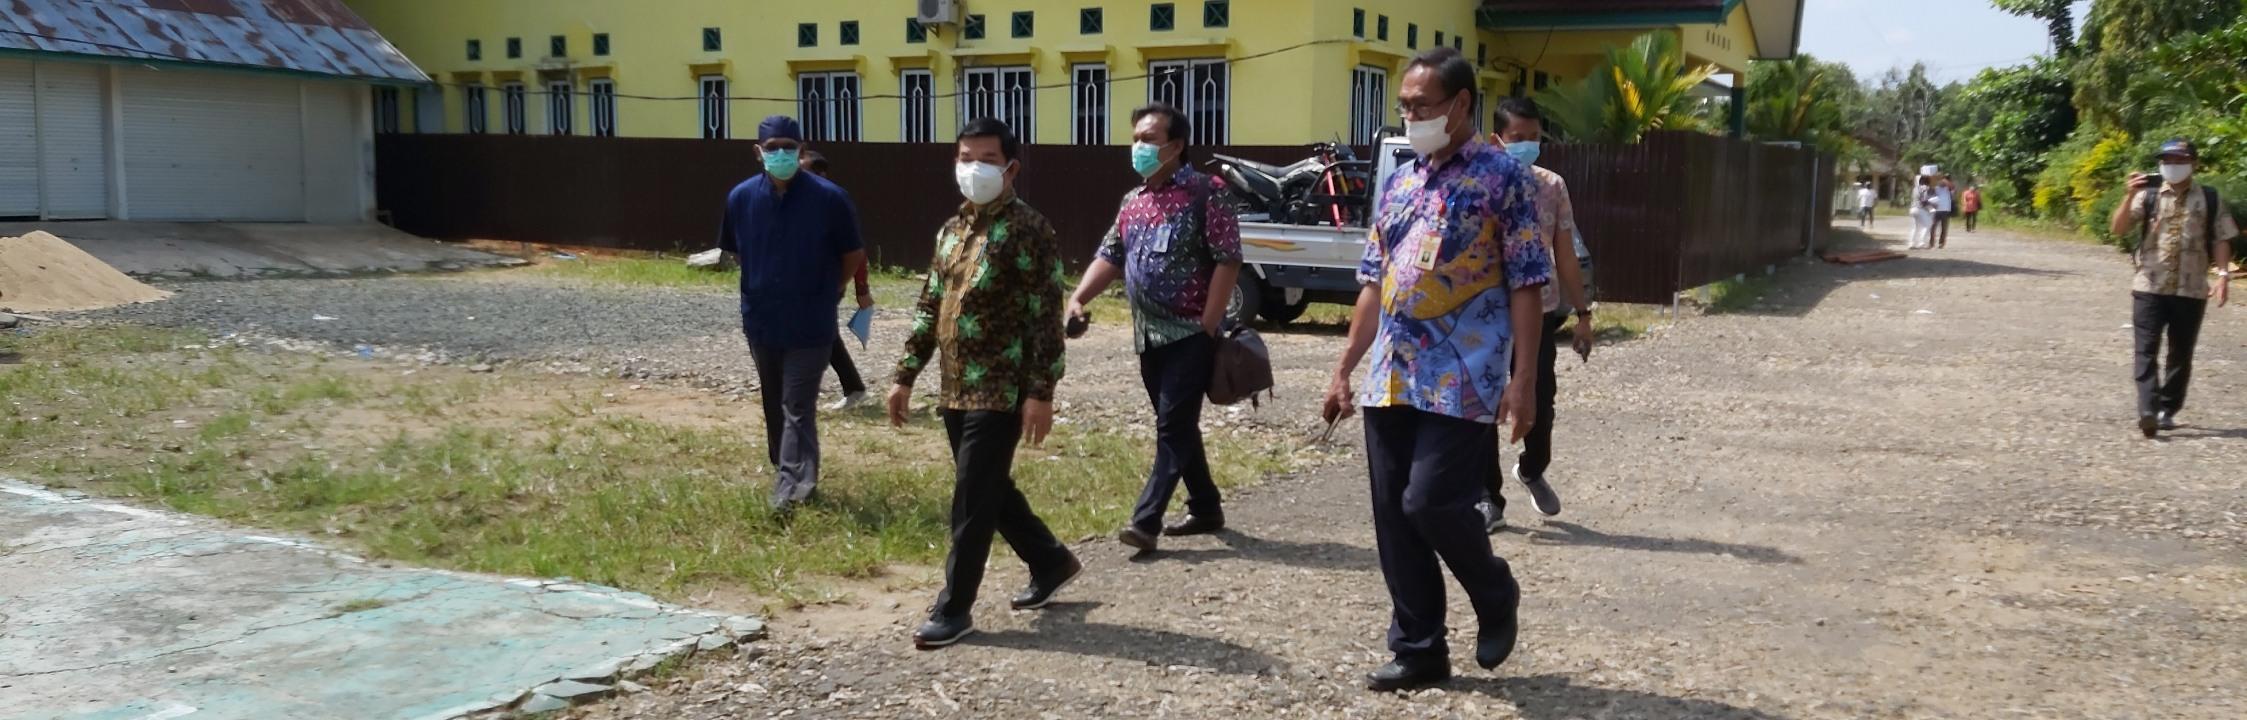 Bupati Barito Timur Pantau Pembangunan Ruang Isolasi Pasien Covid-19